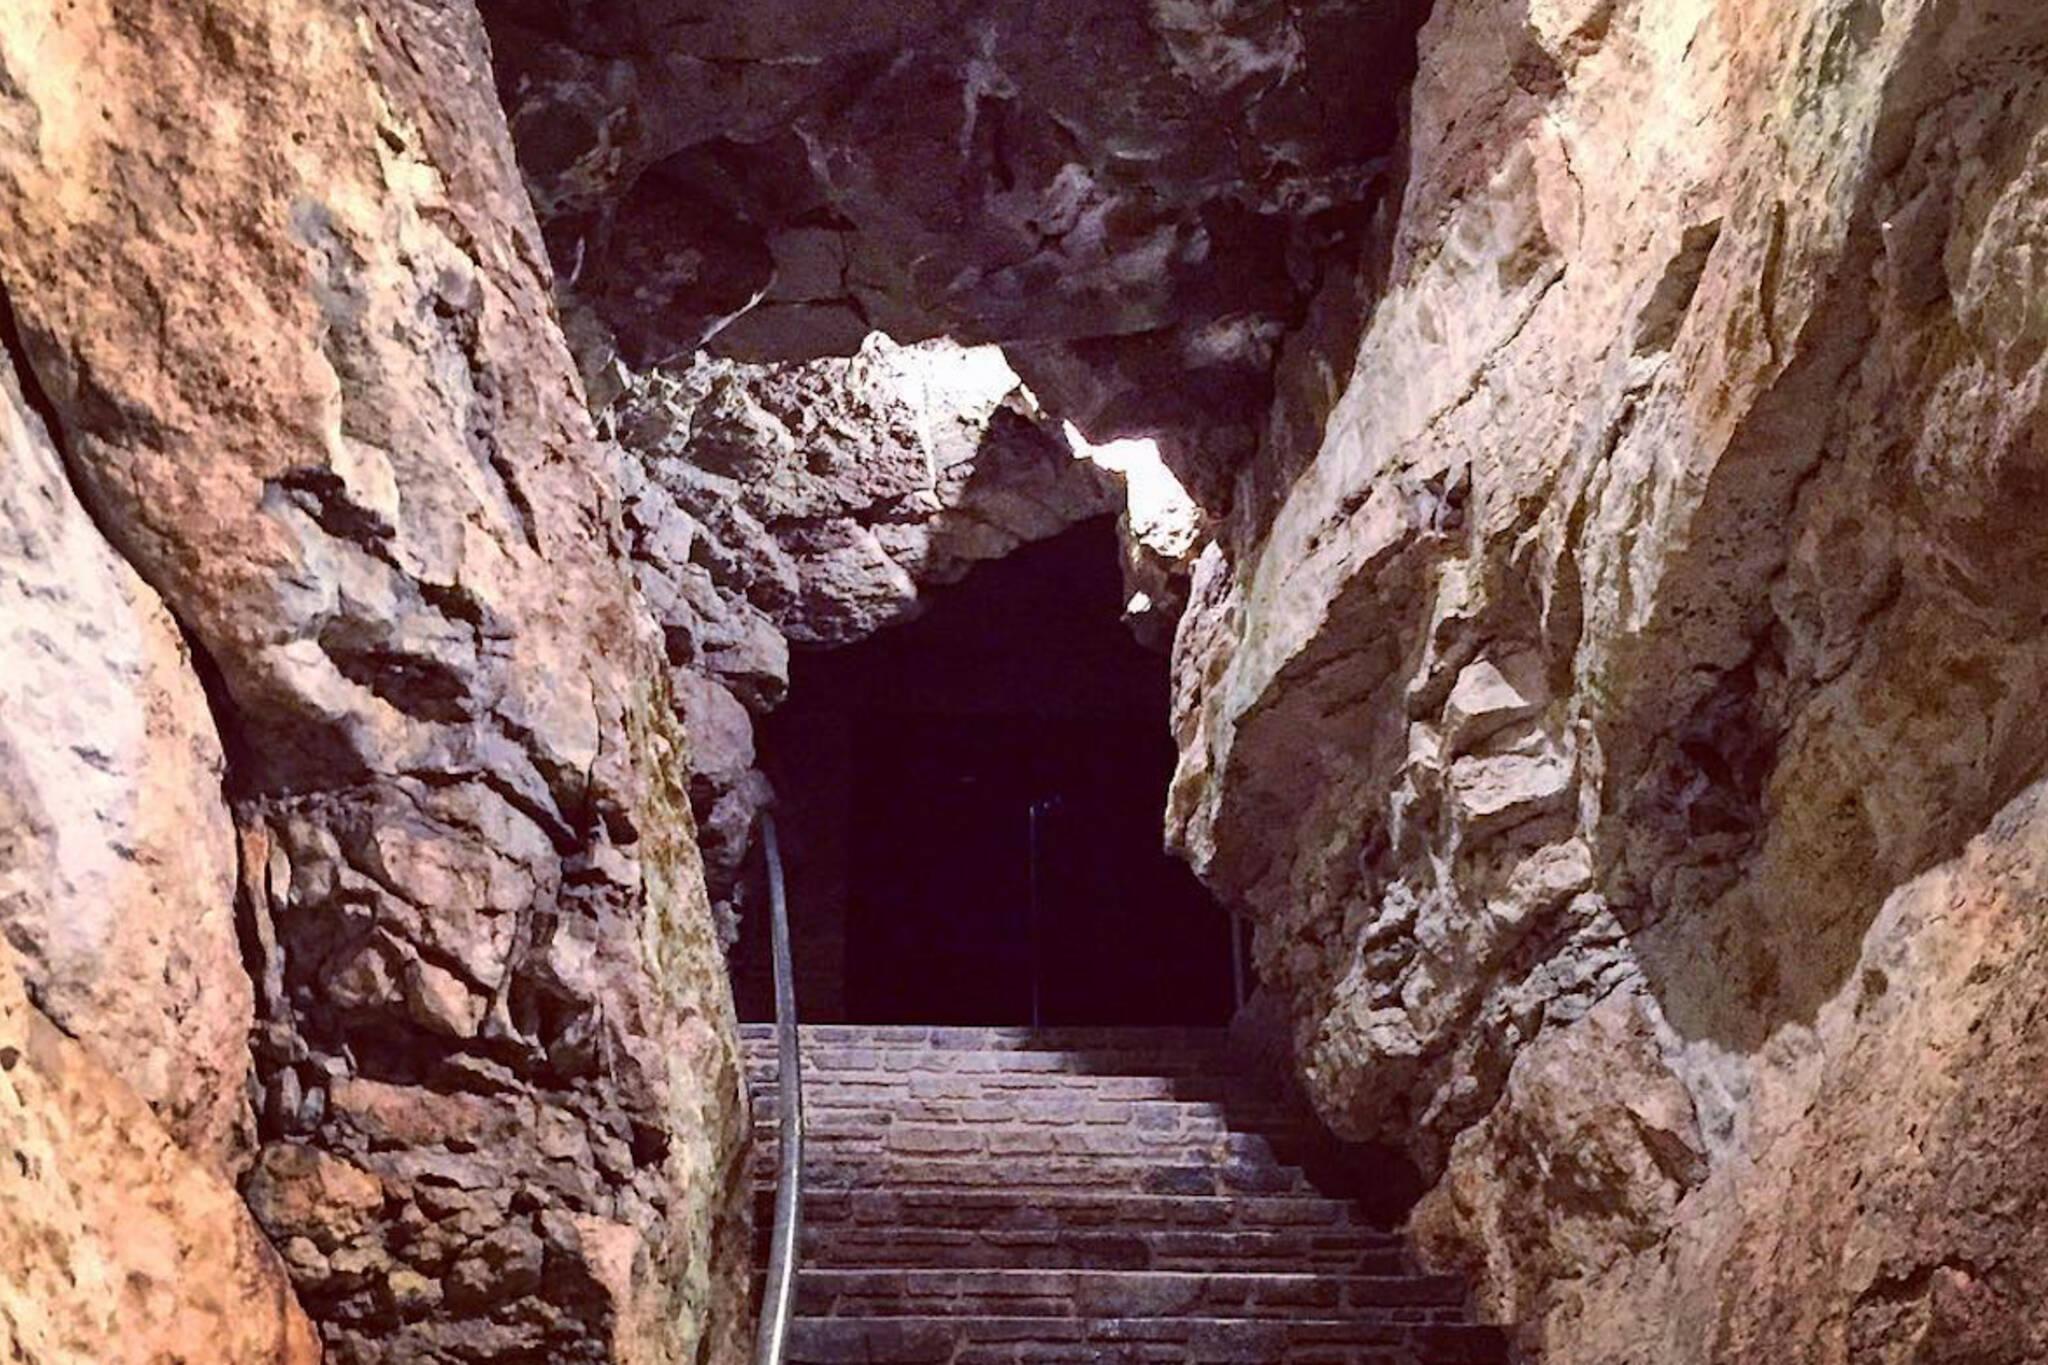 Tyendinaga Caves